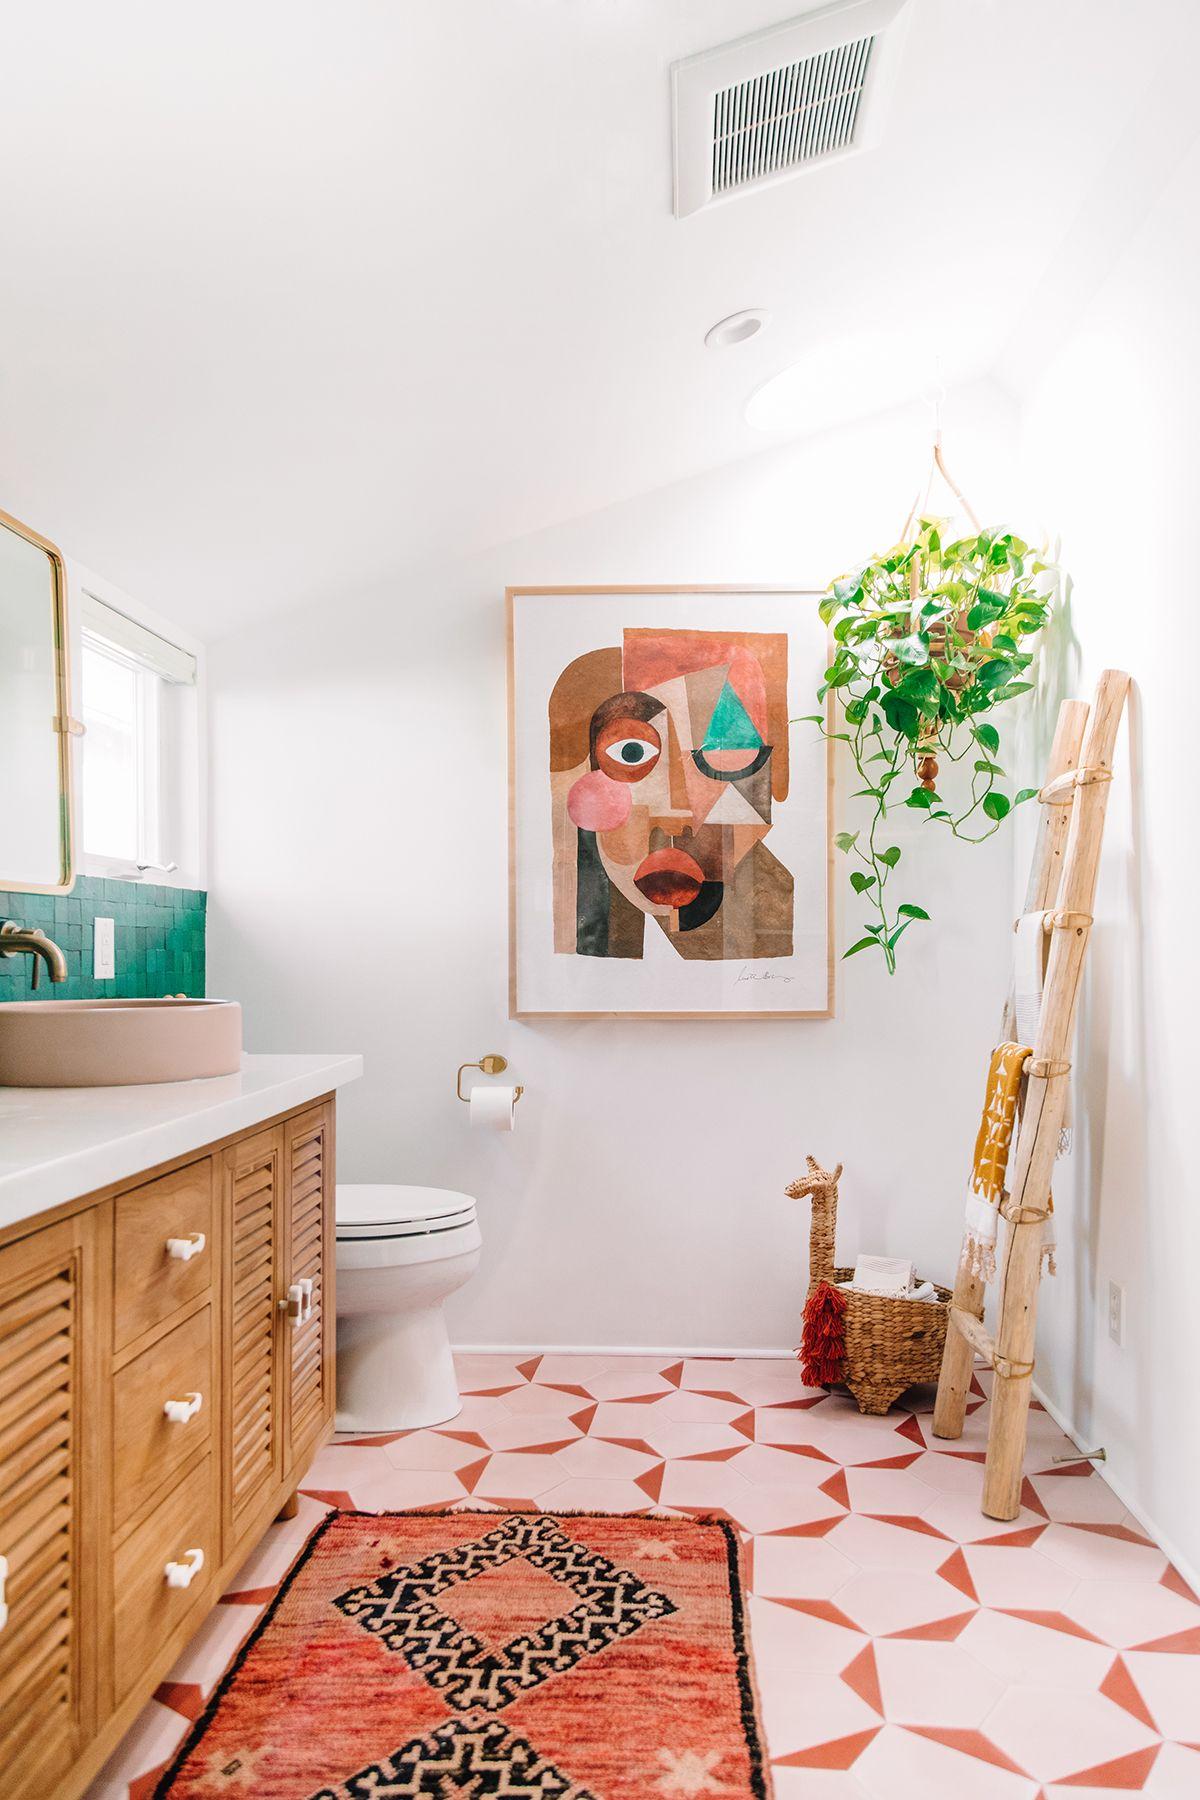 Justina Blakeney wall art featured at Studio DIY